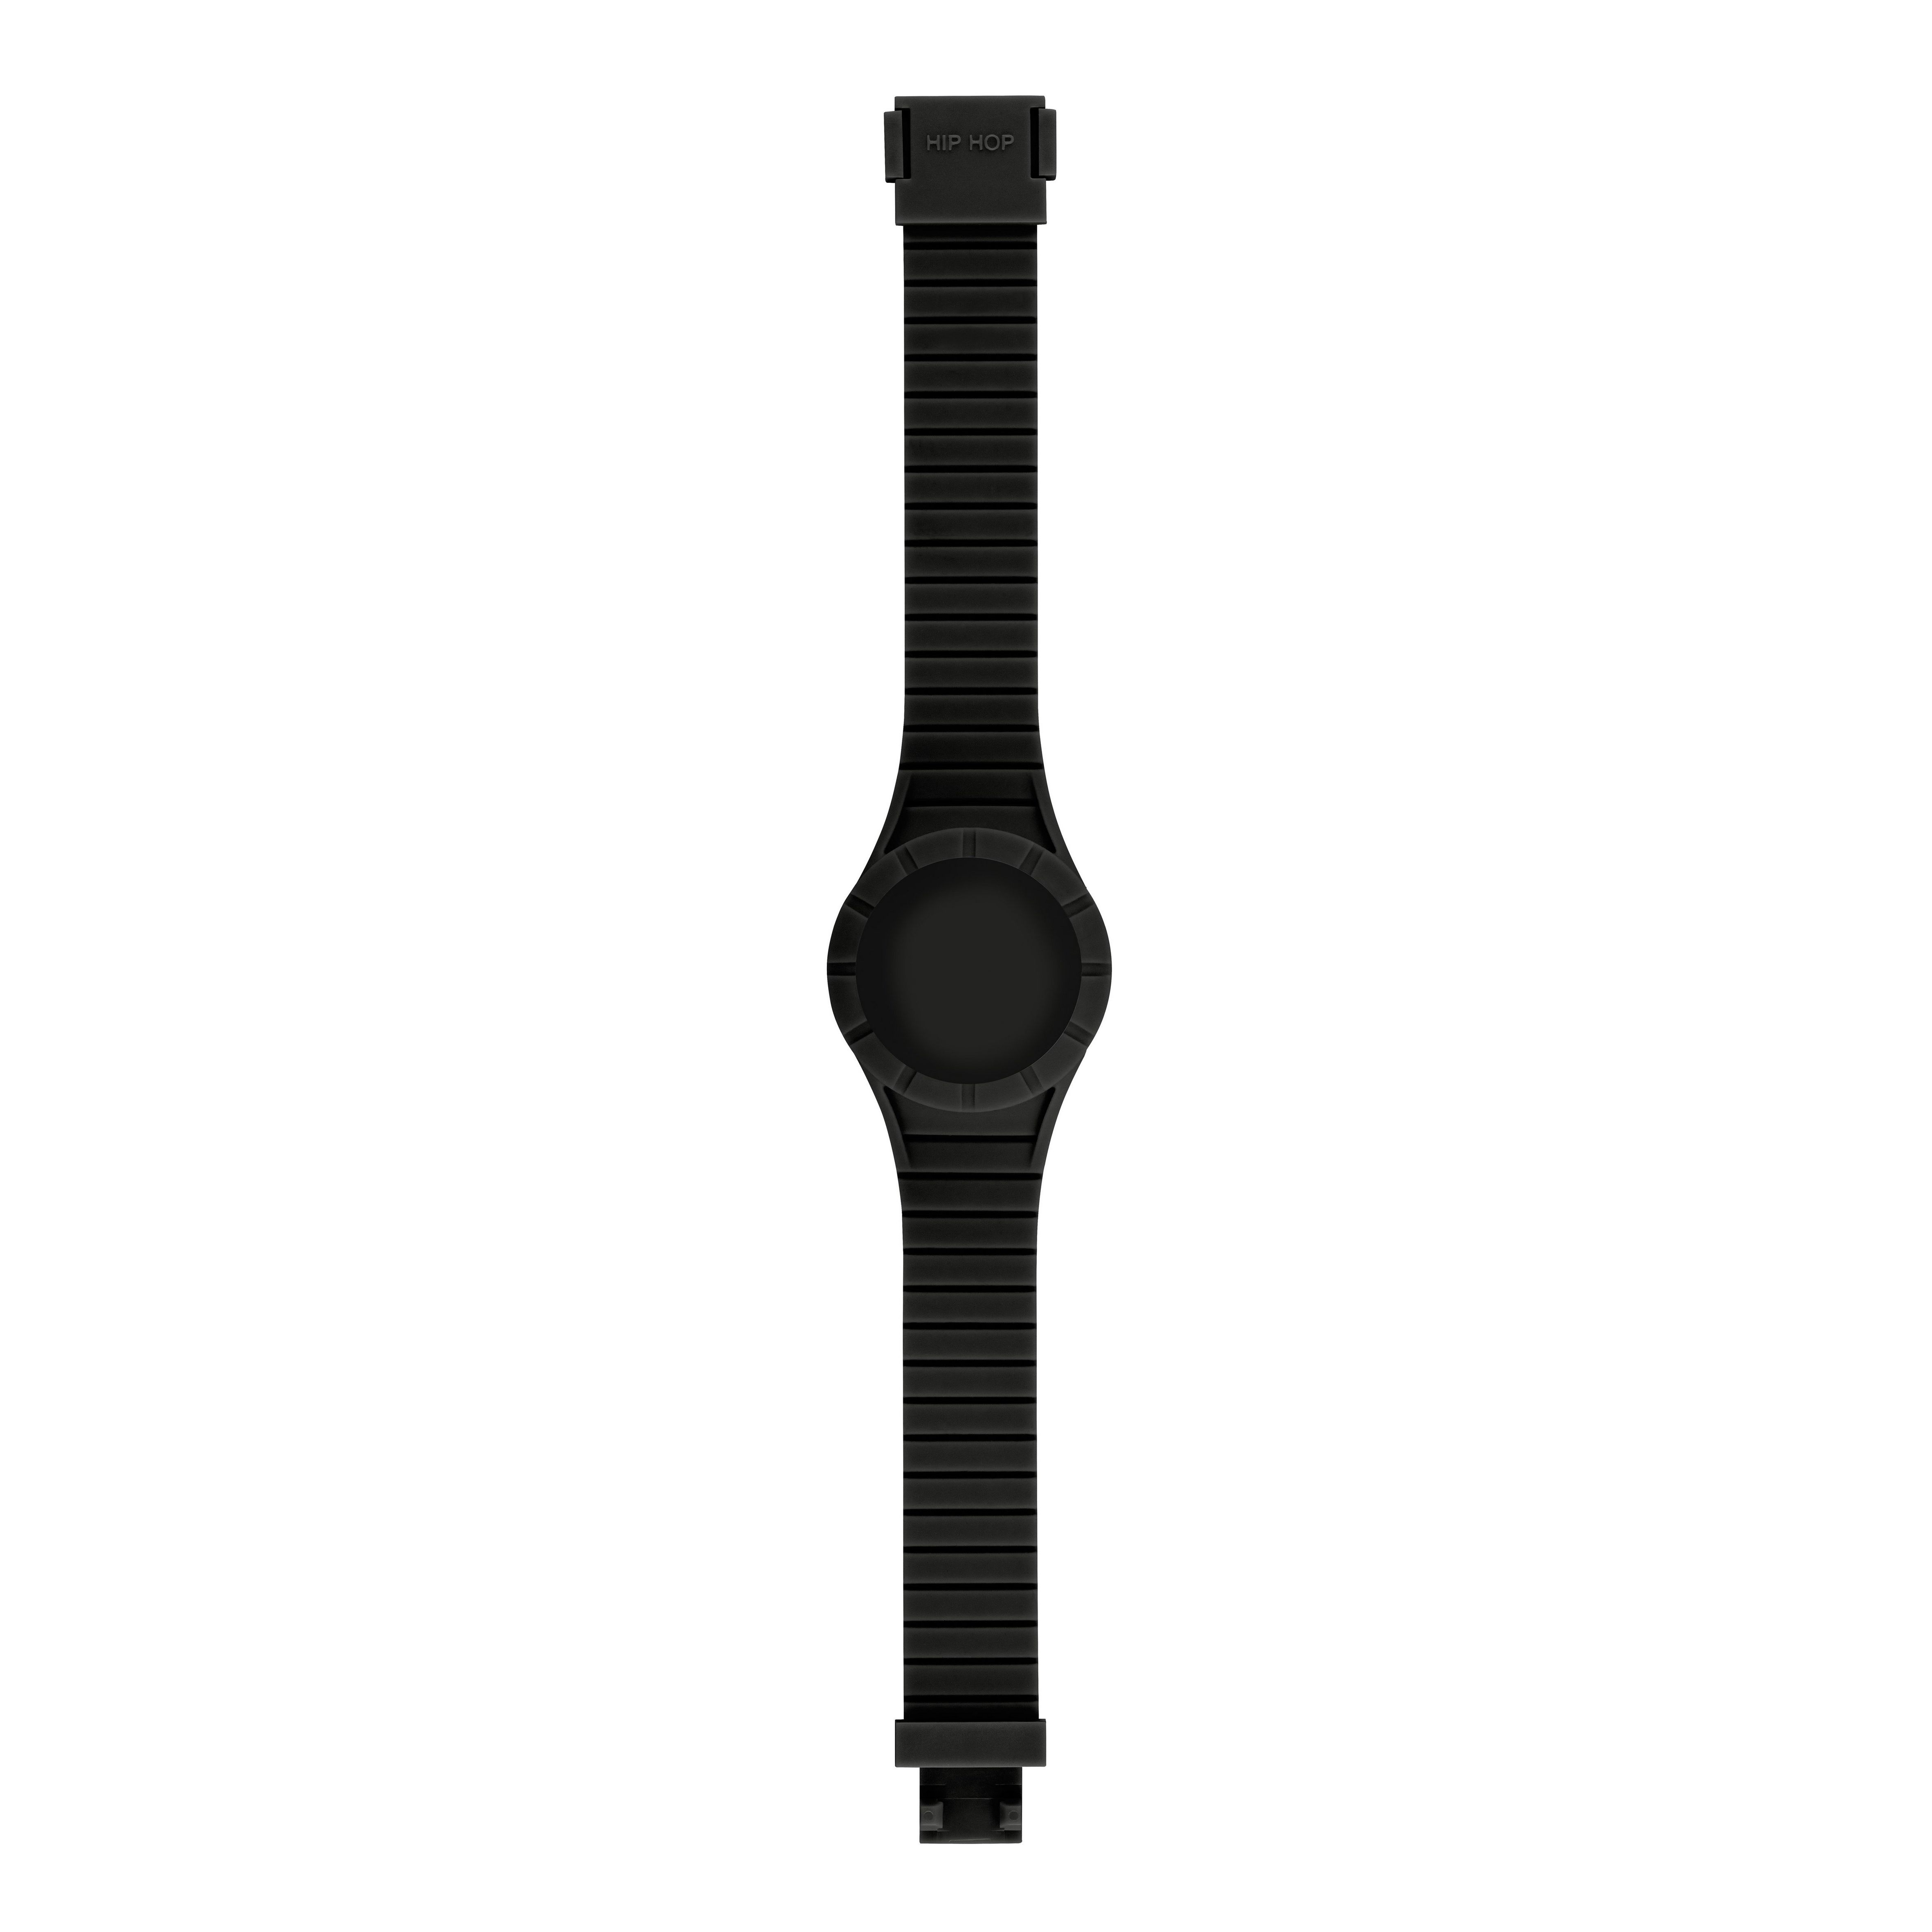 miglior servizio 9d0ea cf2a5 cinturino orologio HIP HOP HBU0656 da uomo EAN:7612901714301